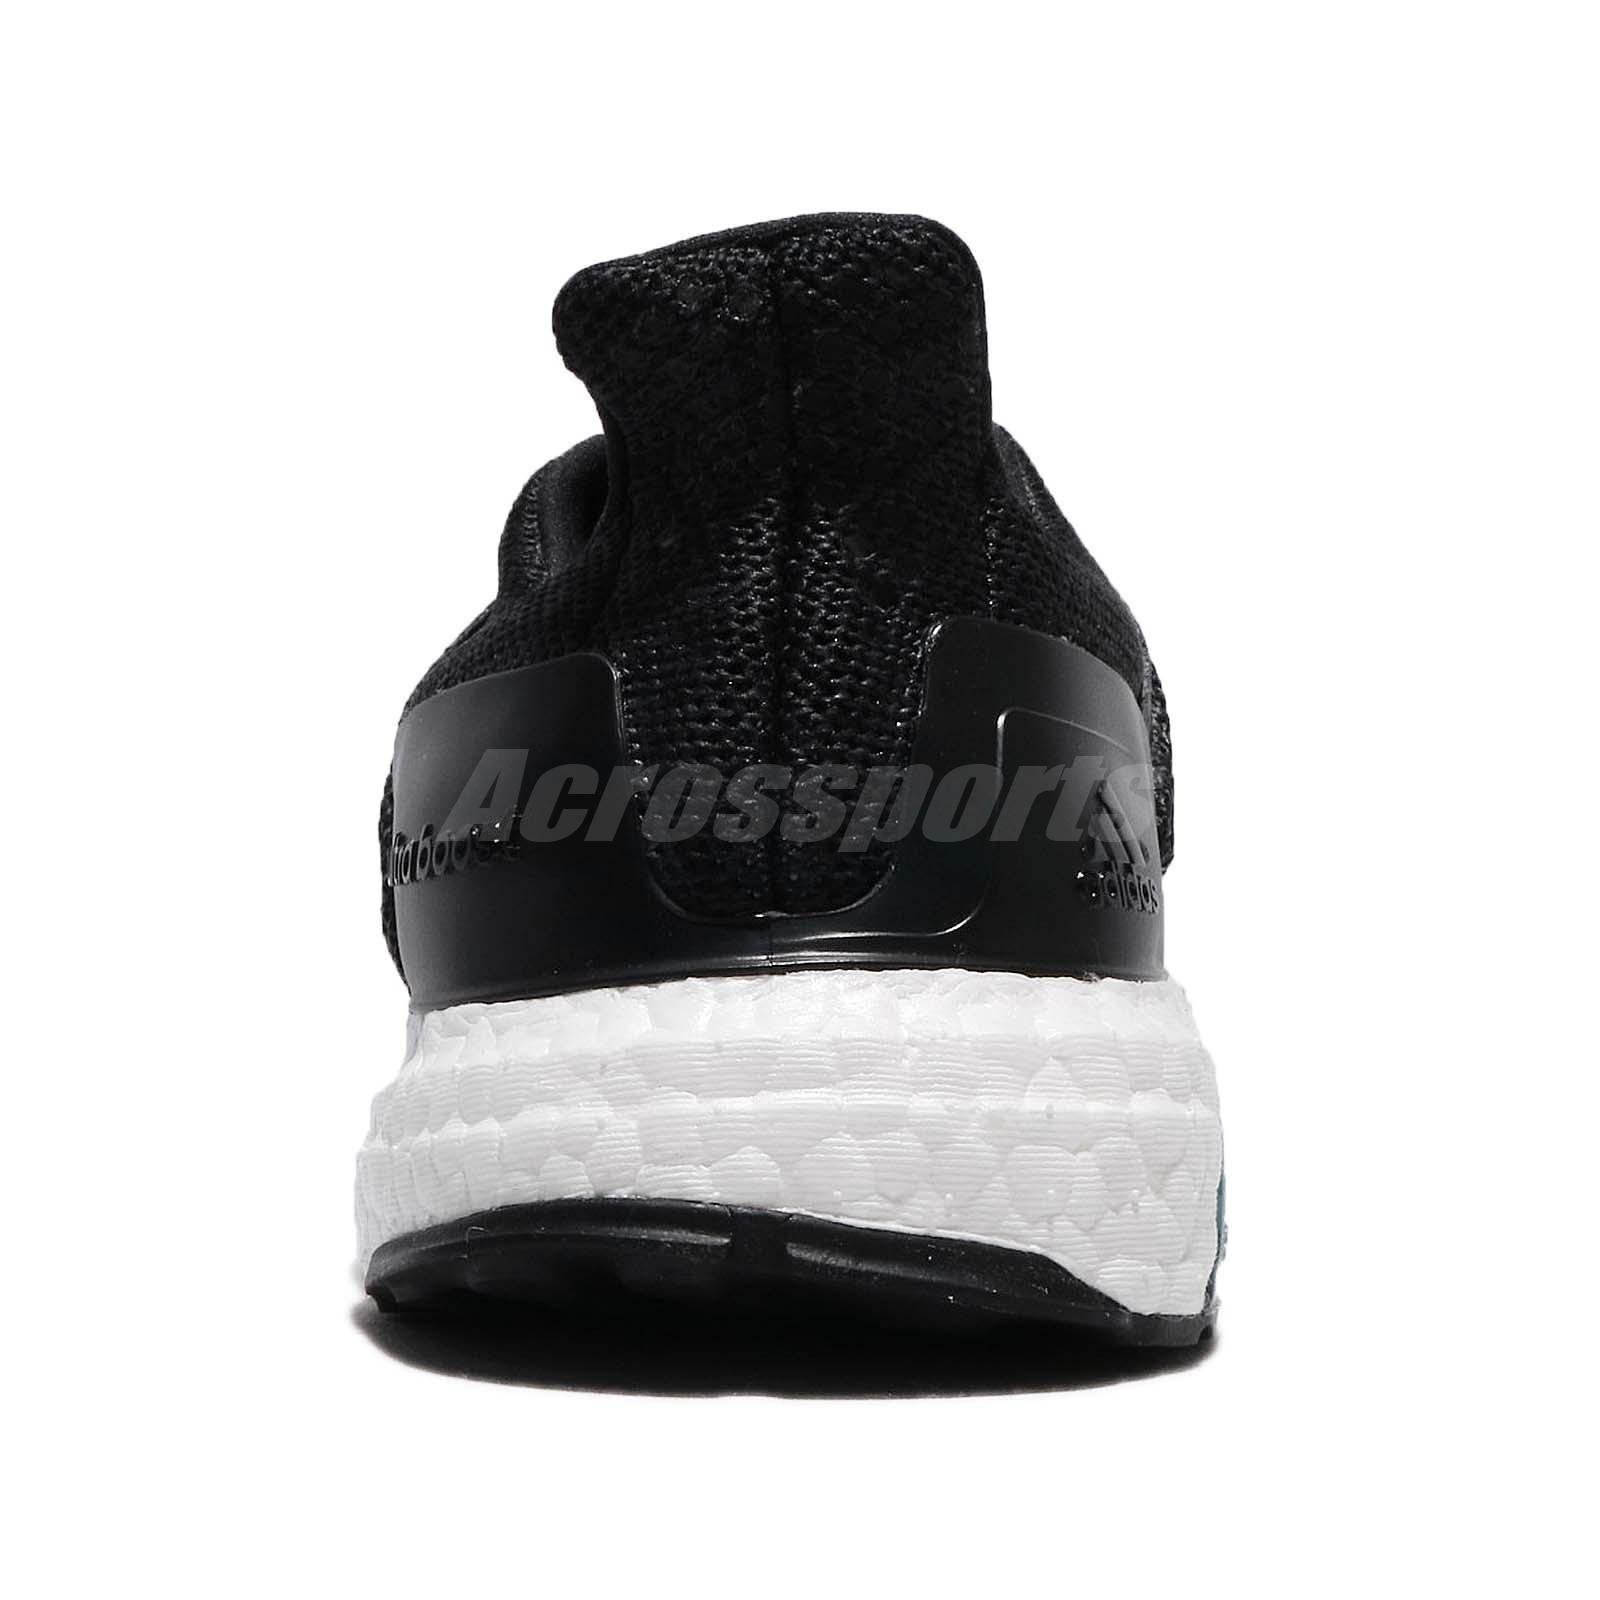 602c138e4 adidas UltraB OOST ST M PrimeKnit Black White Men Running Shoes ...